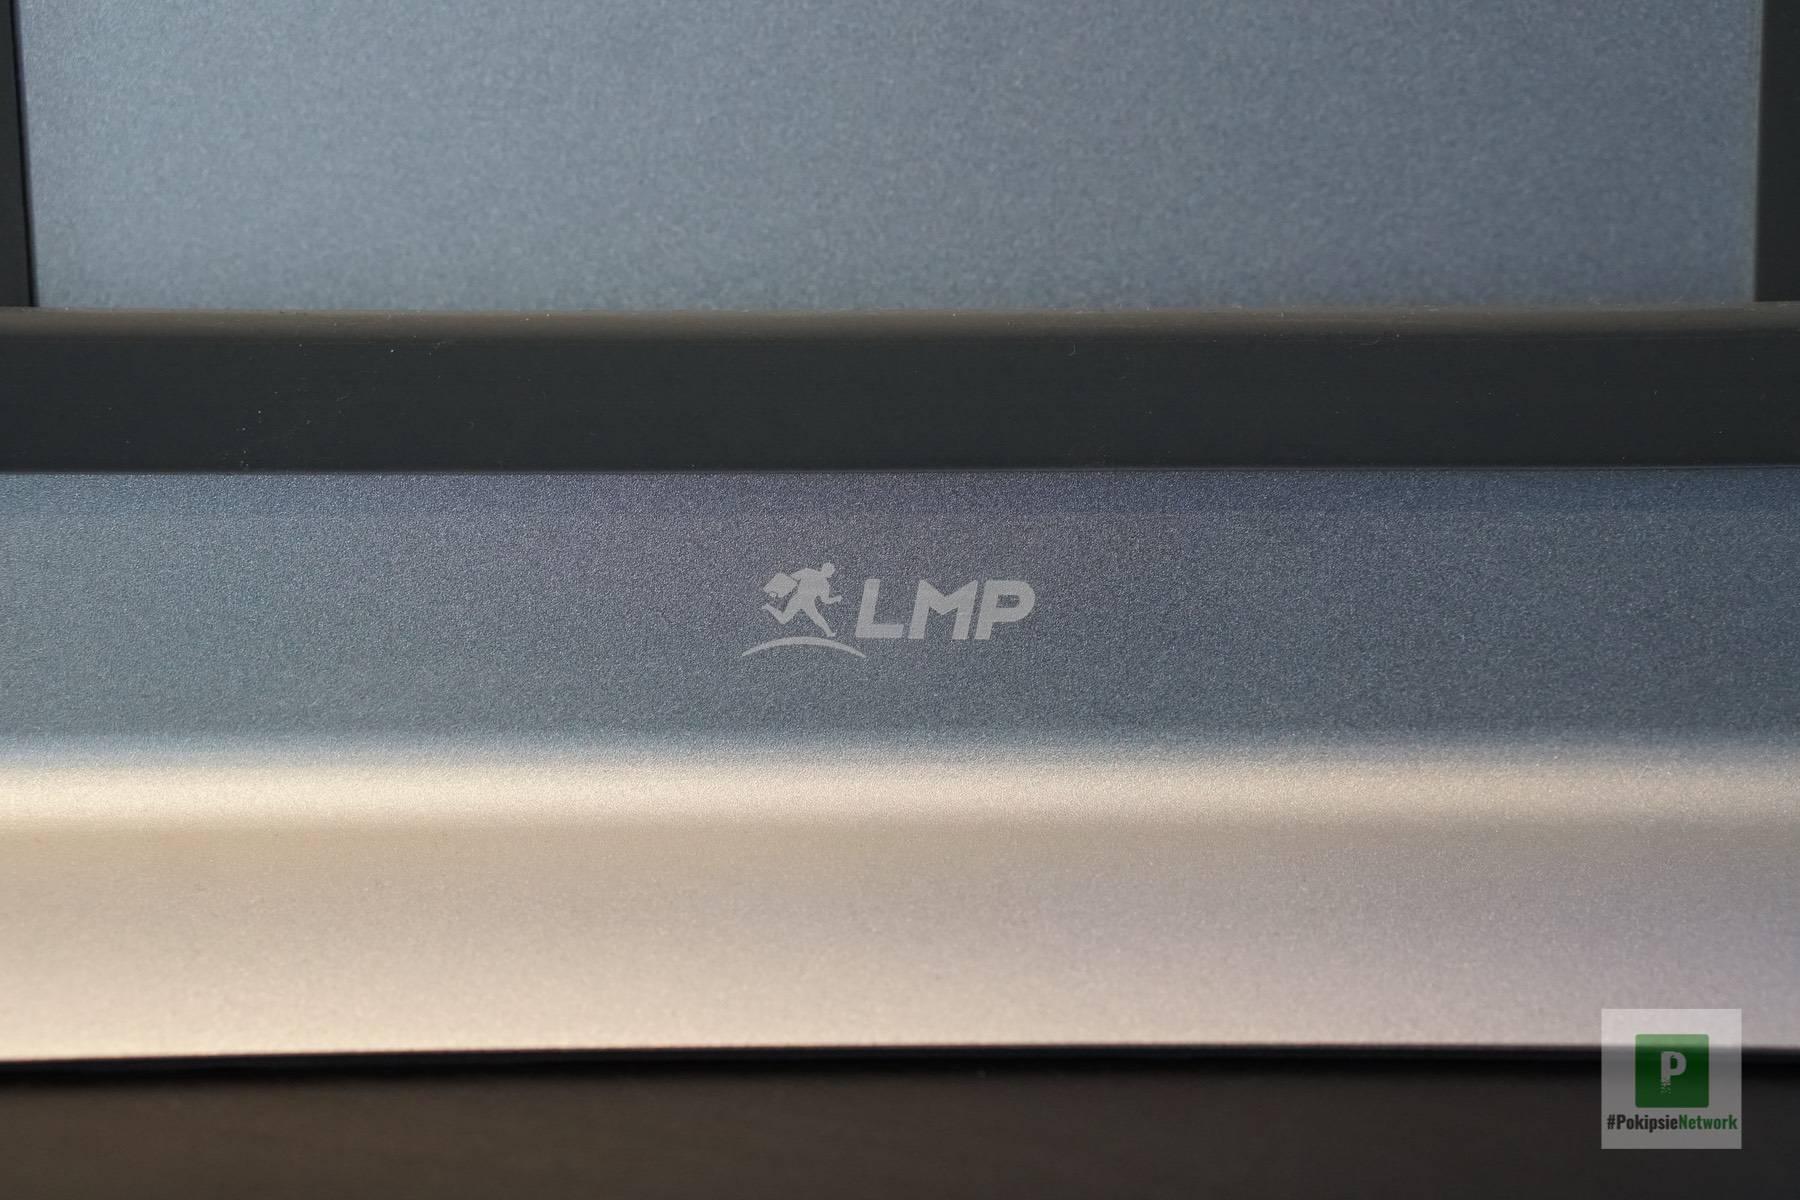 Das LMP-Logo